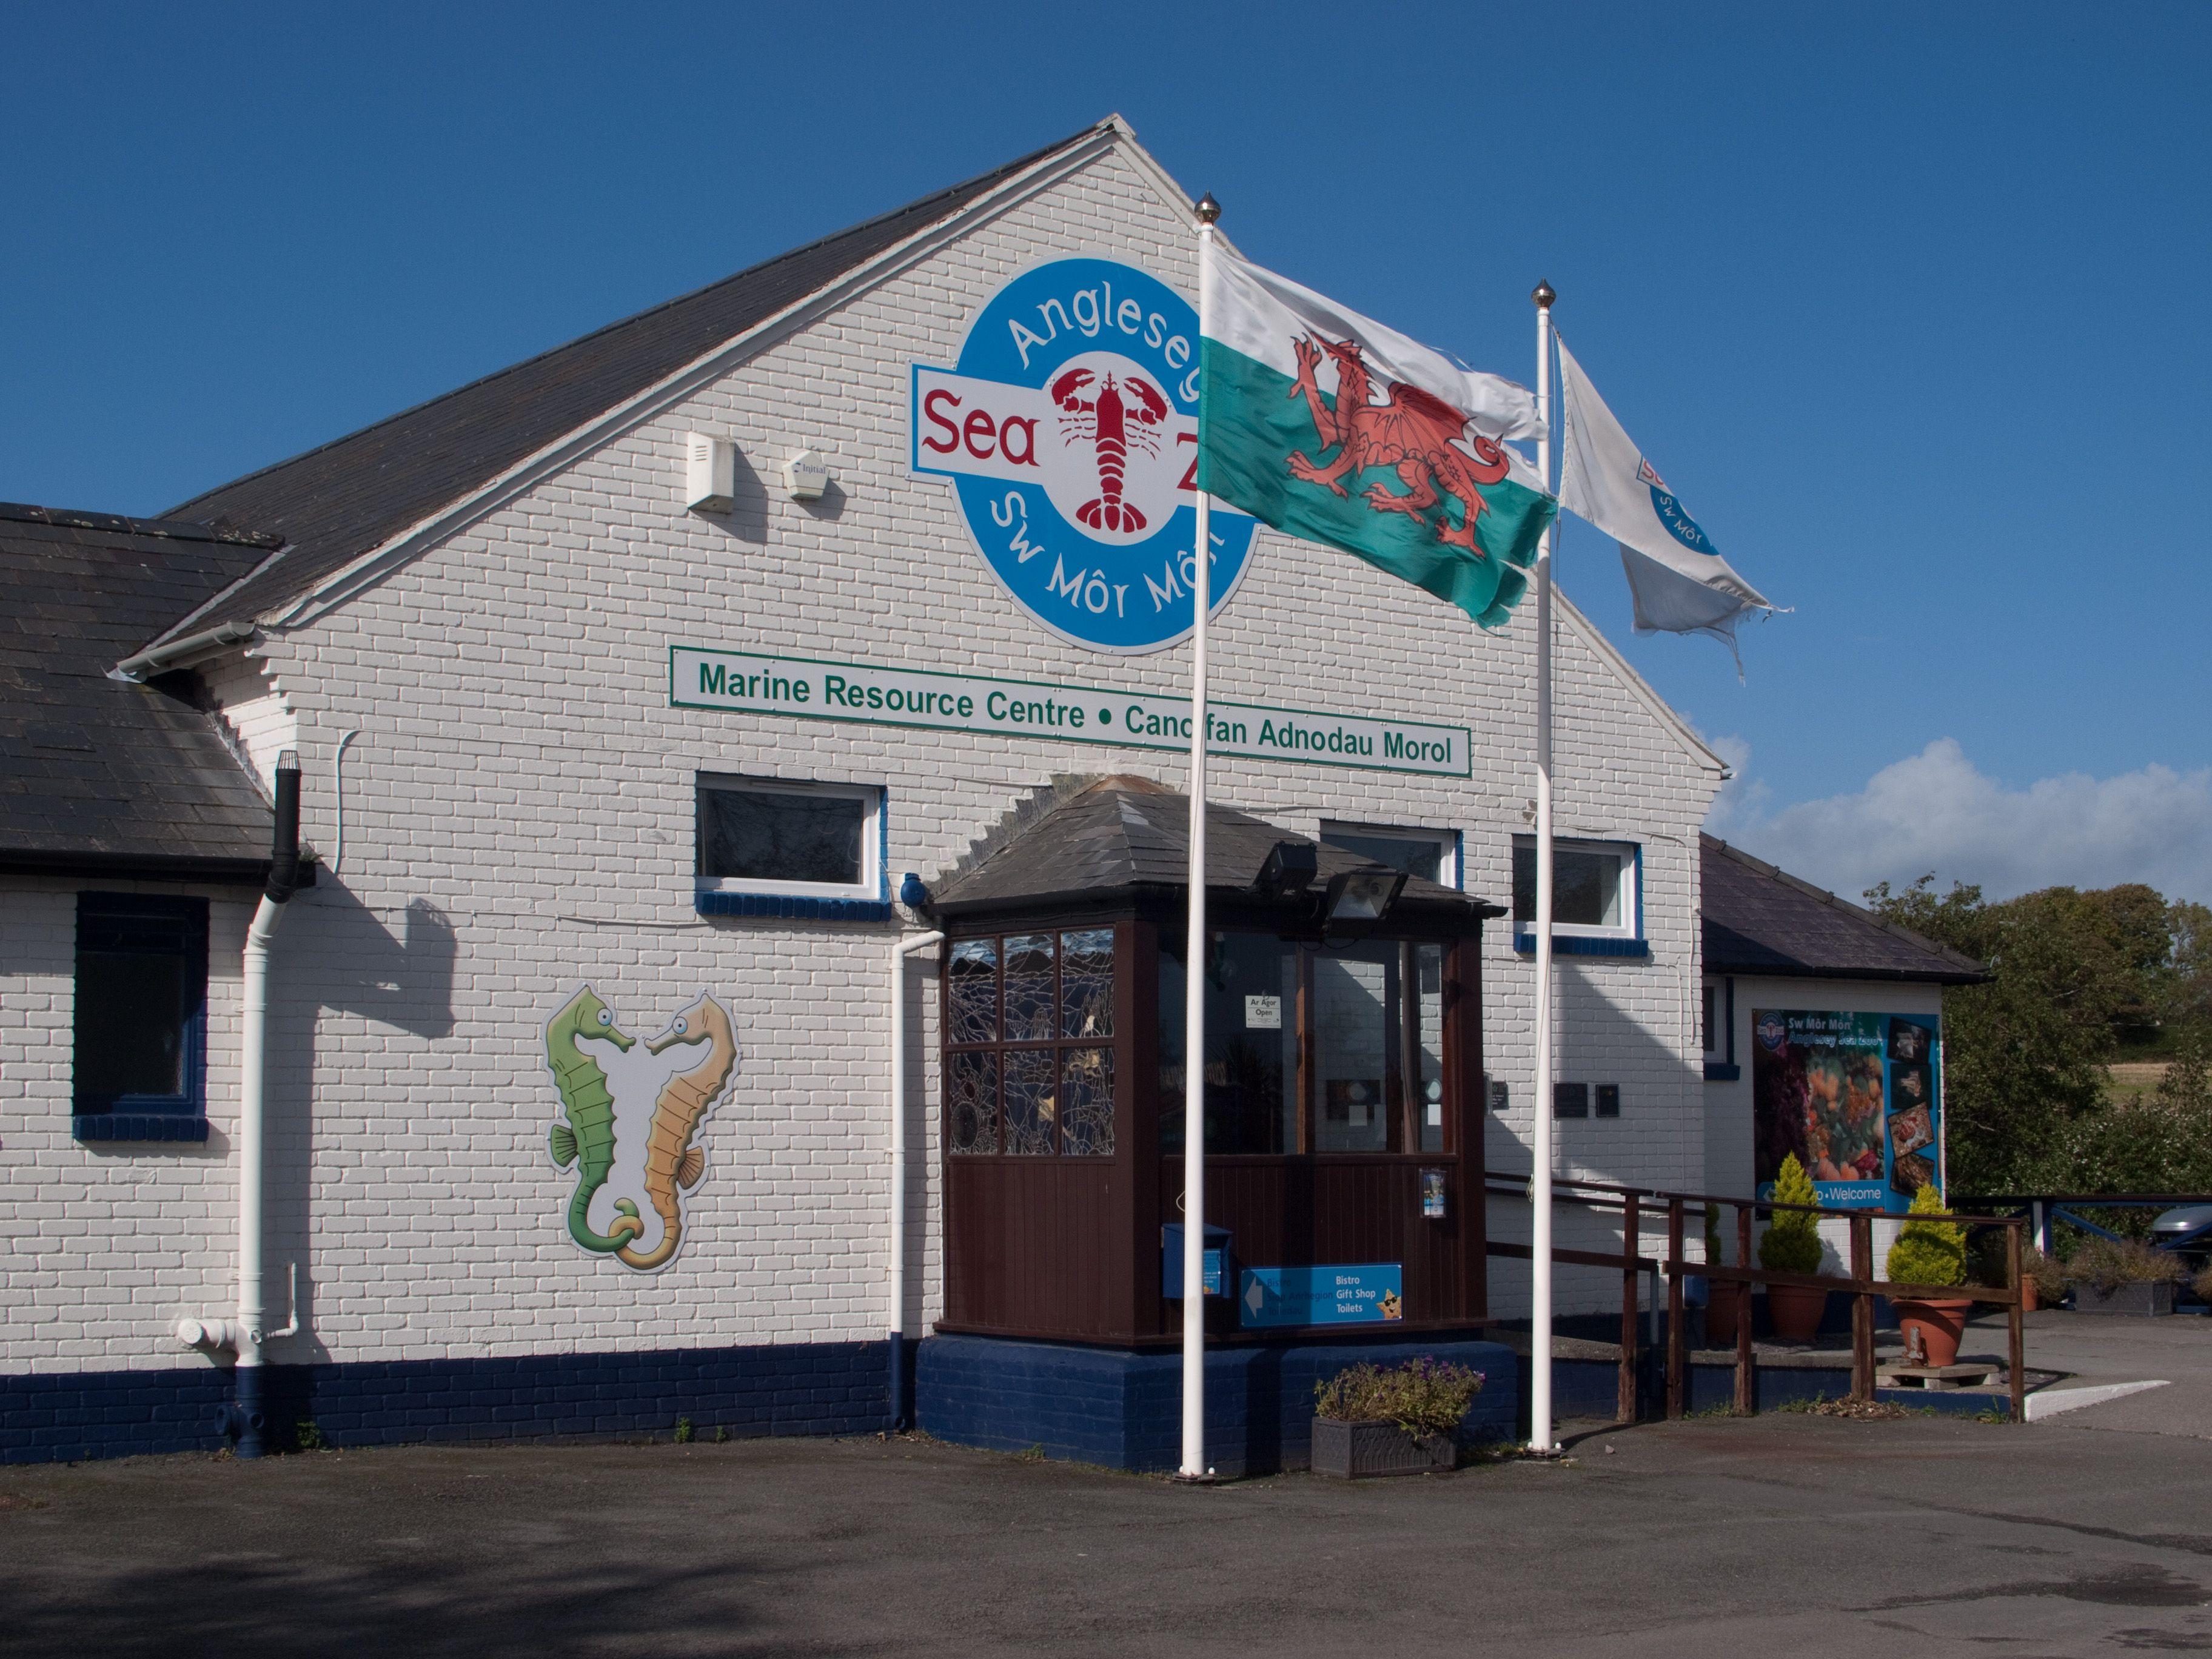 Anglesey Sea Zoo Wales / Cymru Pinterest